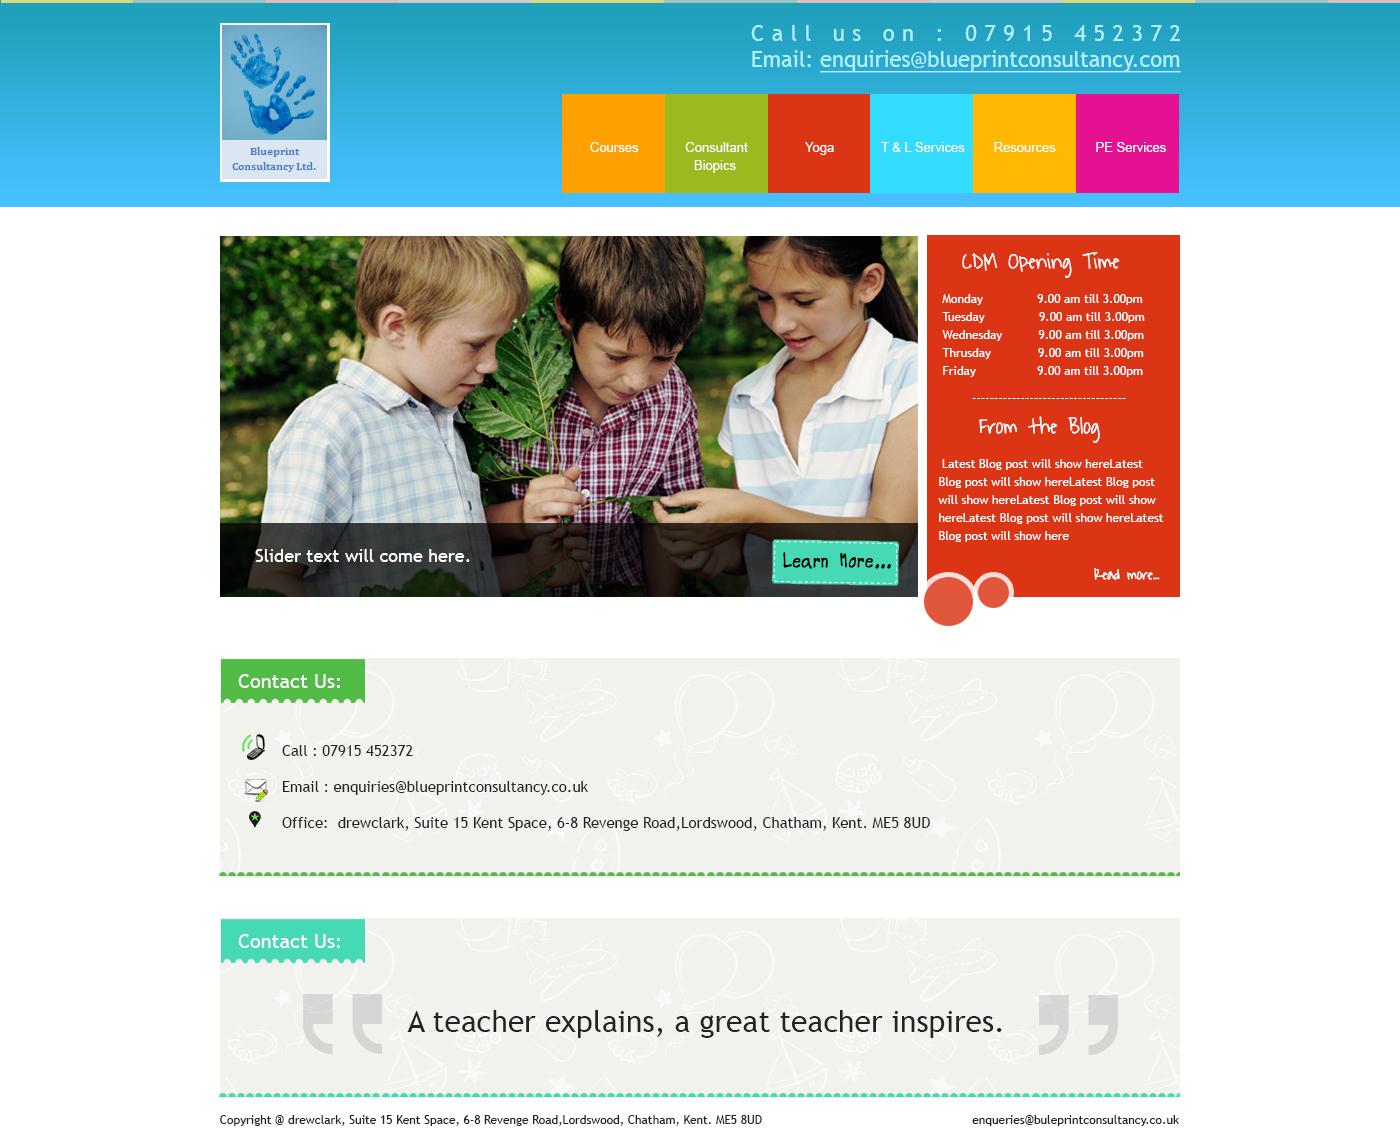 Training Web Design For A Company By Aws Design 3641527